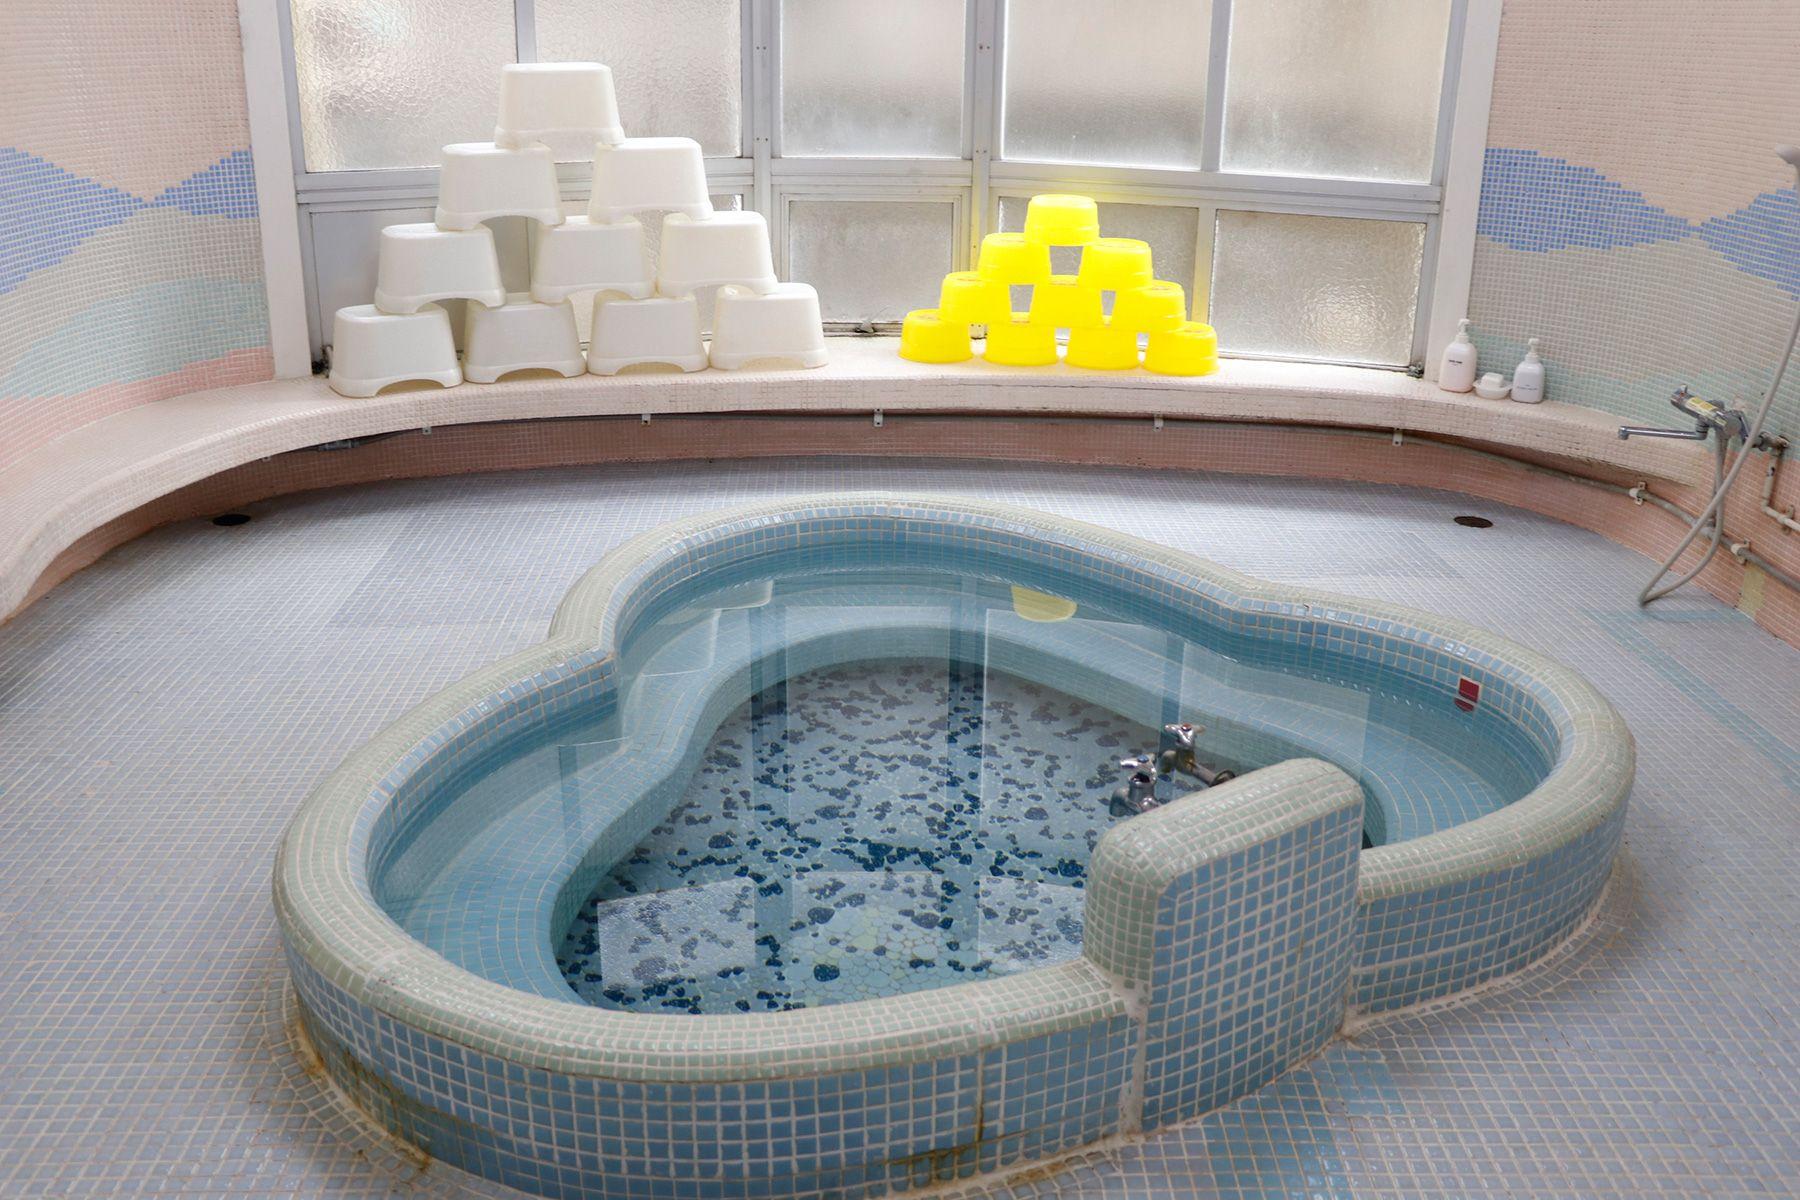 HOMEIKAN 森川別館/旅館 (ホウメイカン)タイルのお風呂(千鳥風呂)